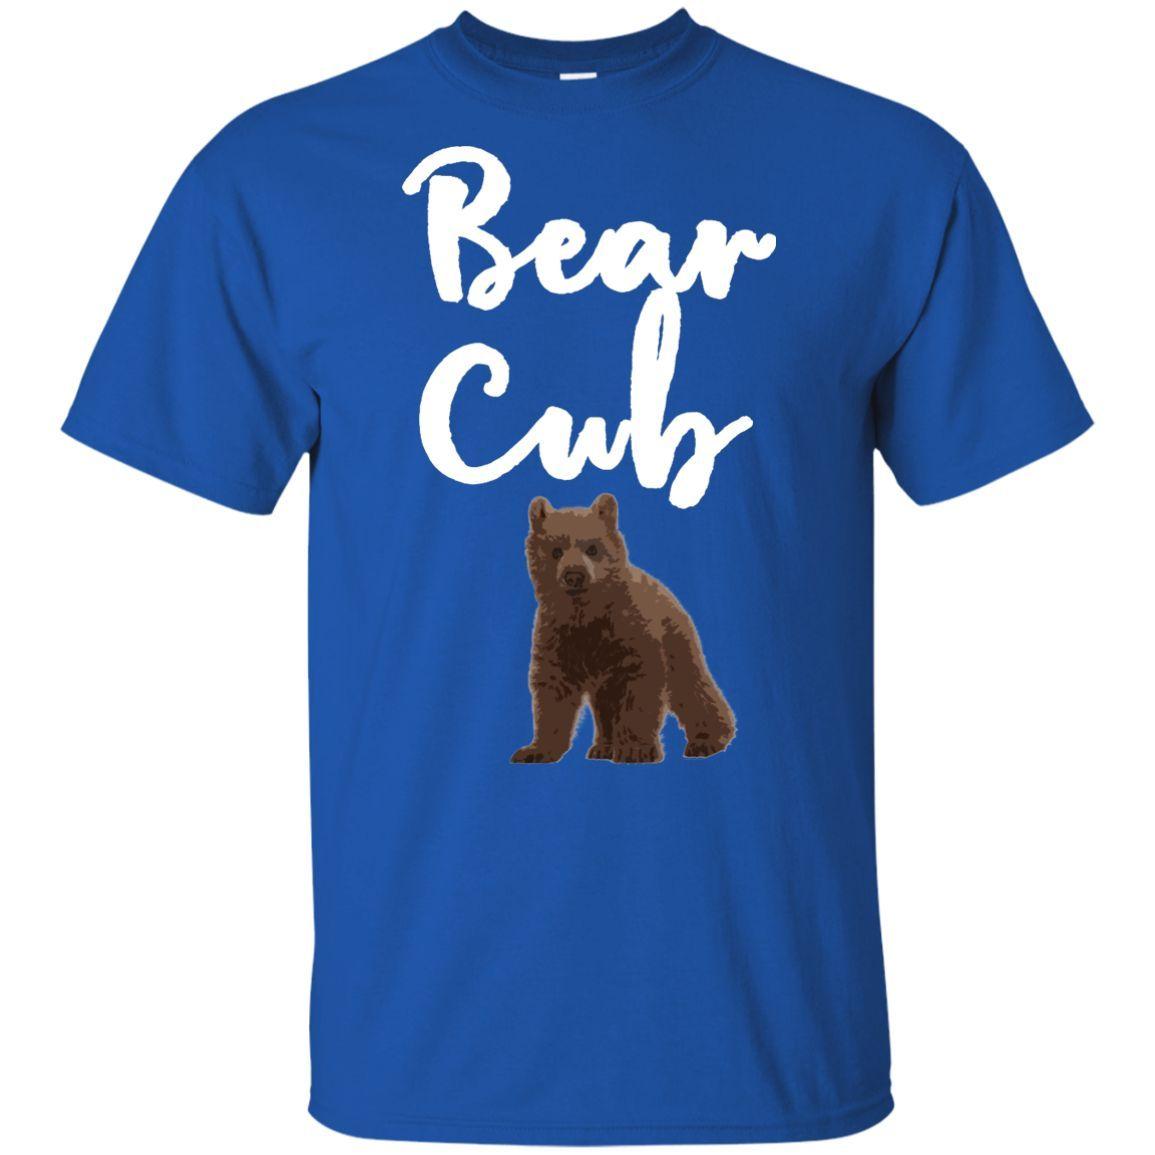 Bear Cub Ultra Cotton Tee